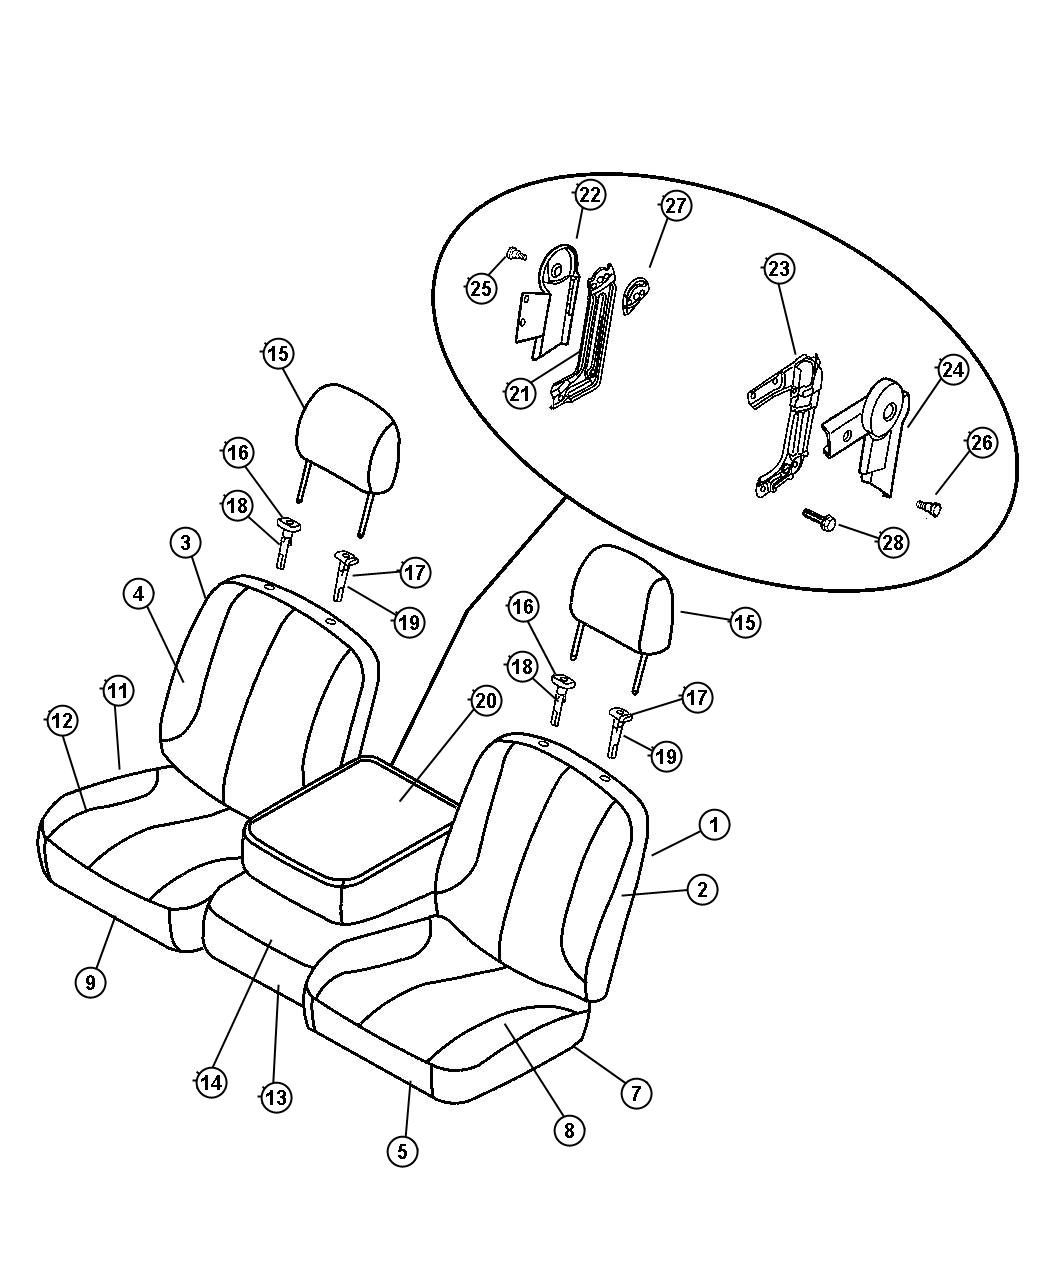 Dodge Ram 1500 Cover. Front seat center. [j3]. Trim: [hd